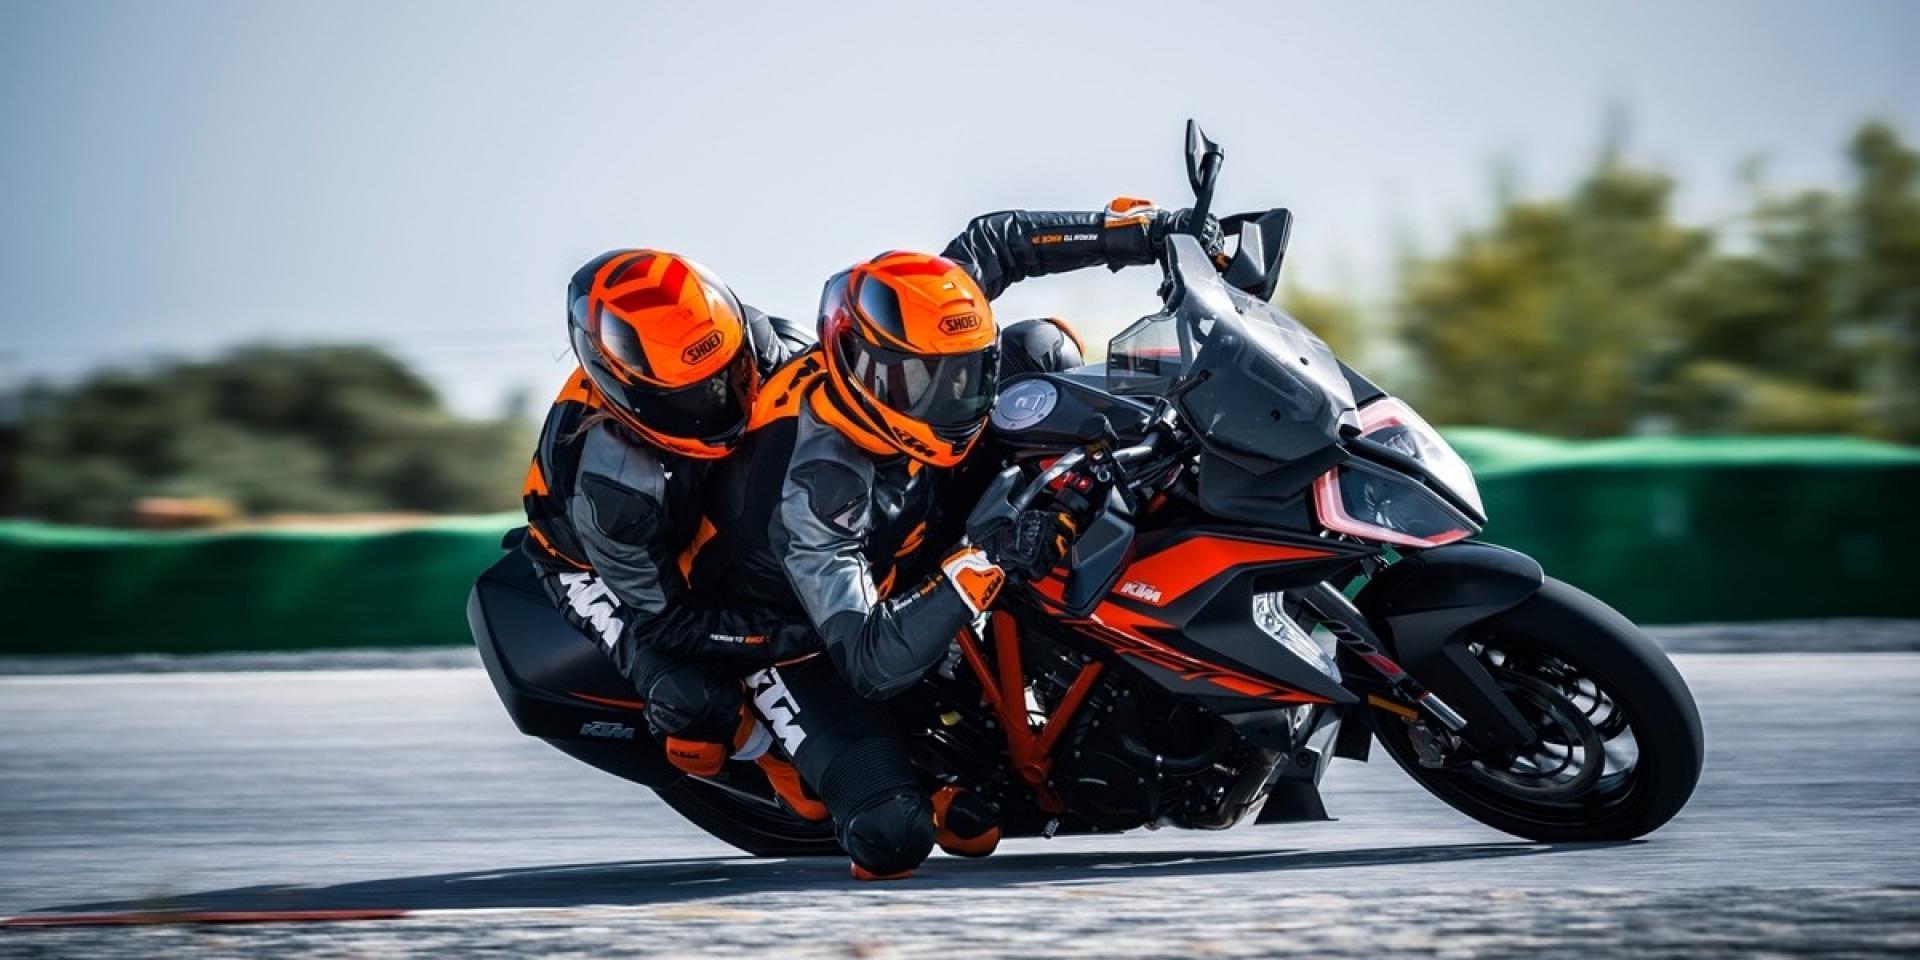 2018科隆車展。卡普狂旅人-2019 KTM Super DUKE GT & Super DUKE R